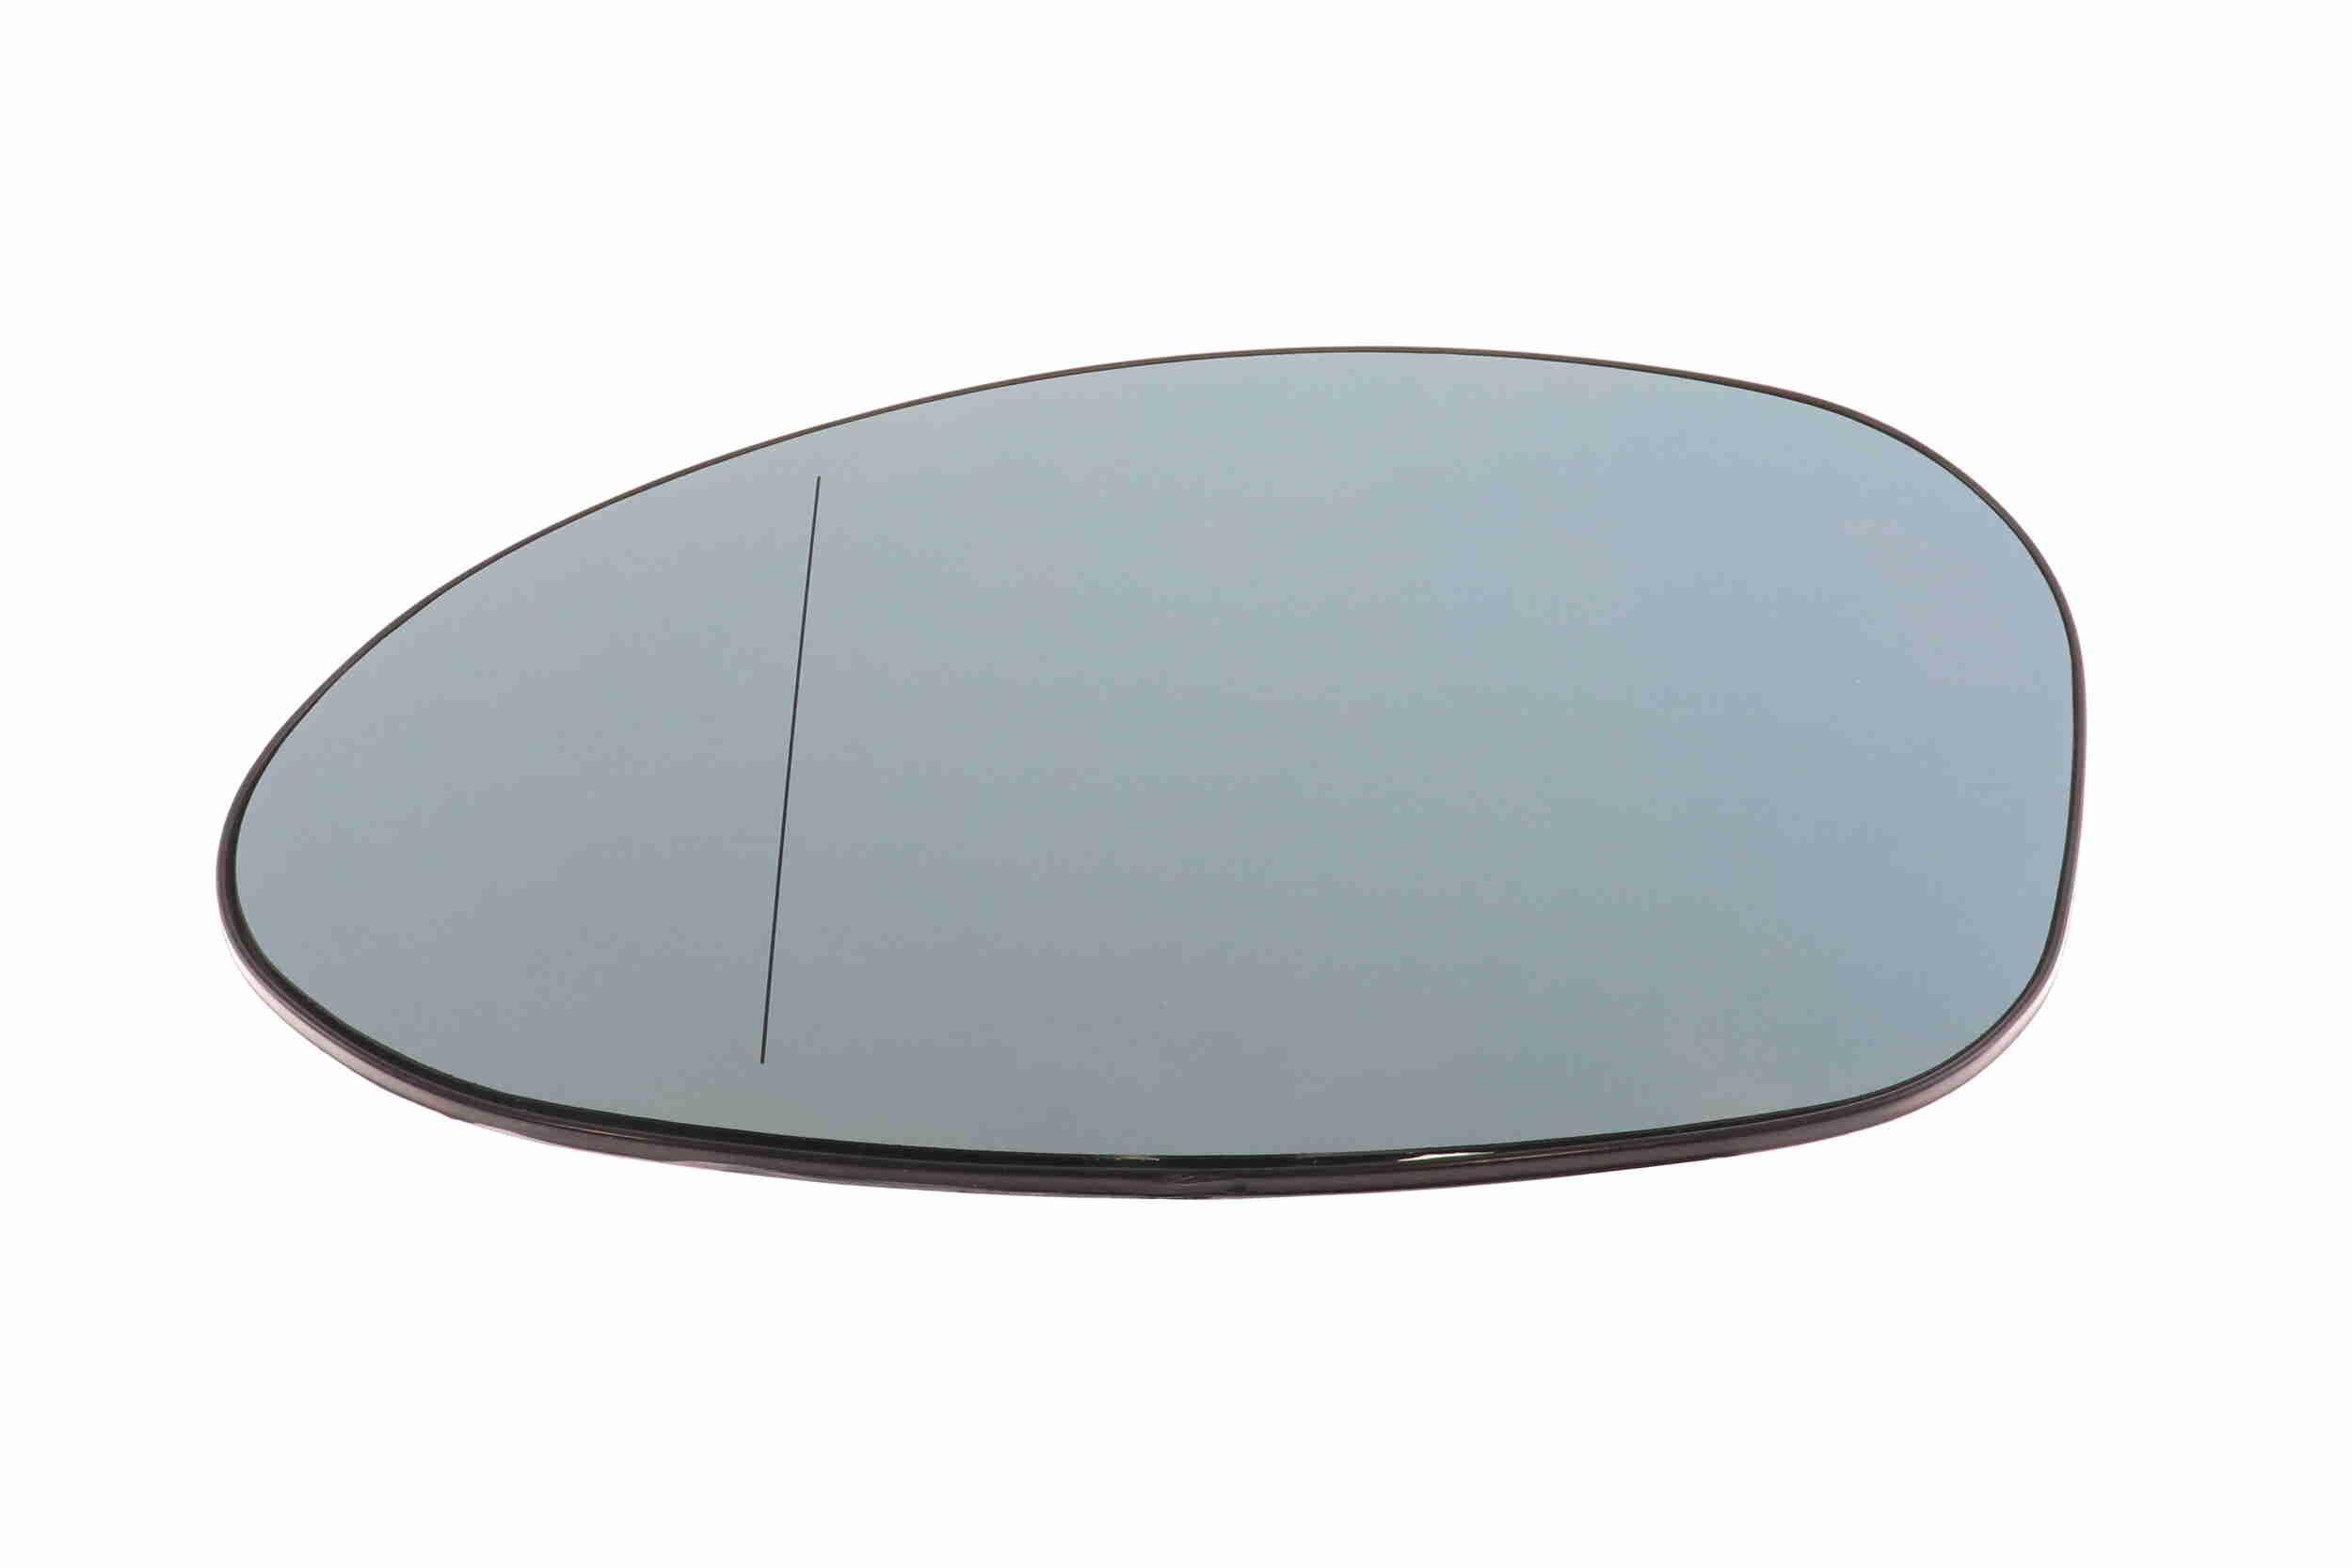 OE Original Außenspiegelglas V20-69-0004 VEMO